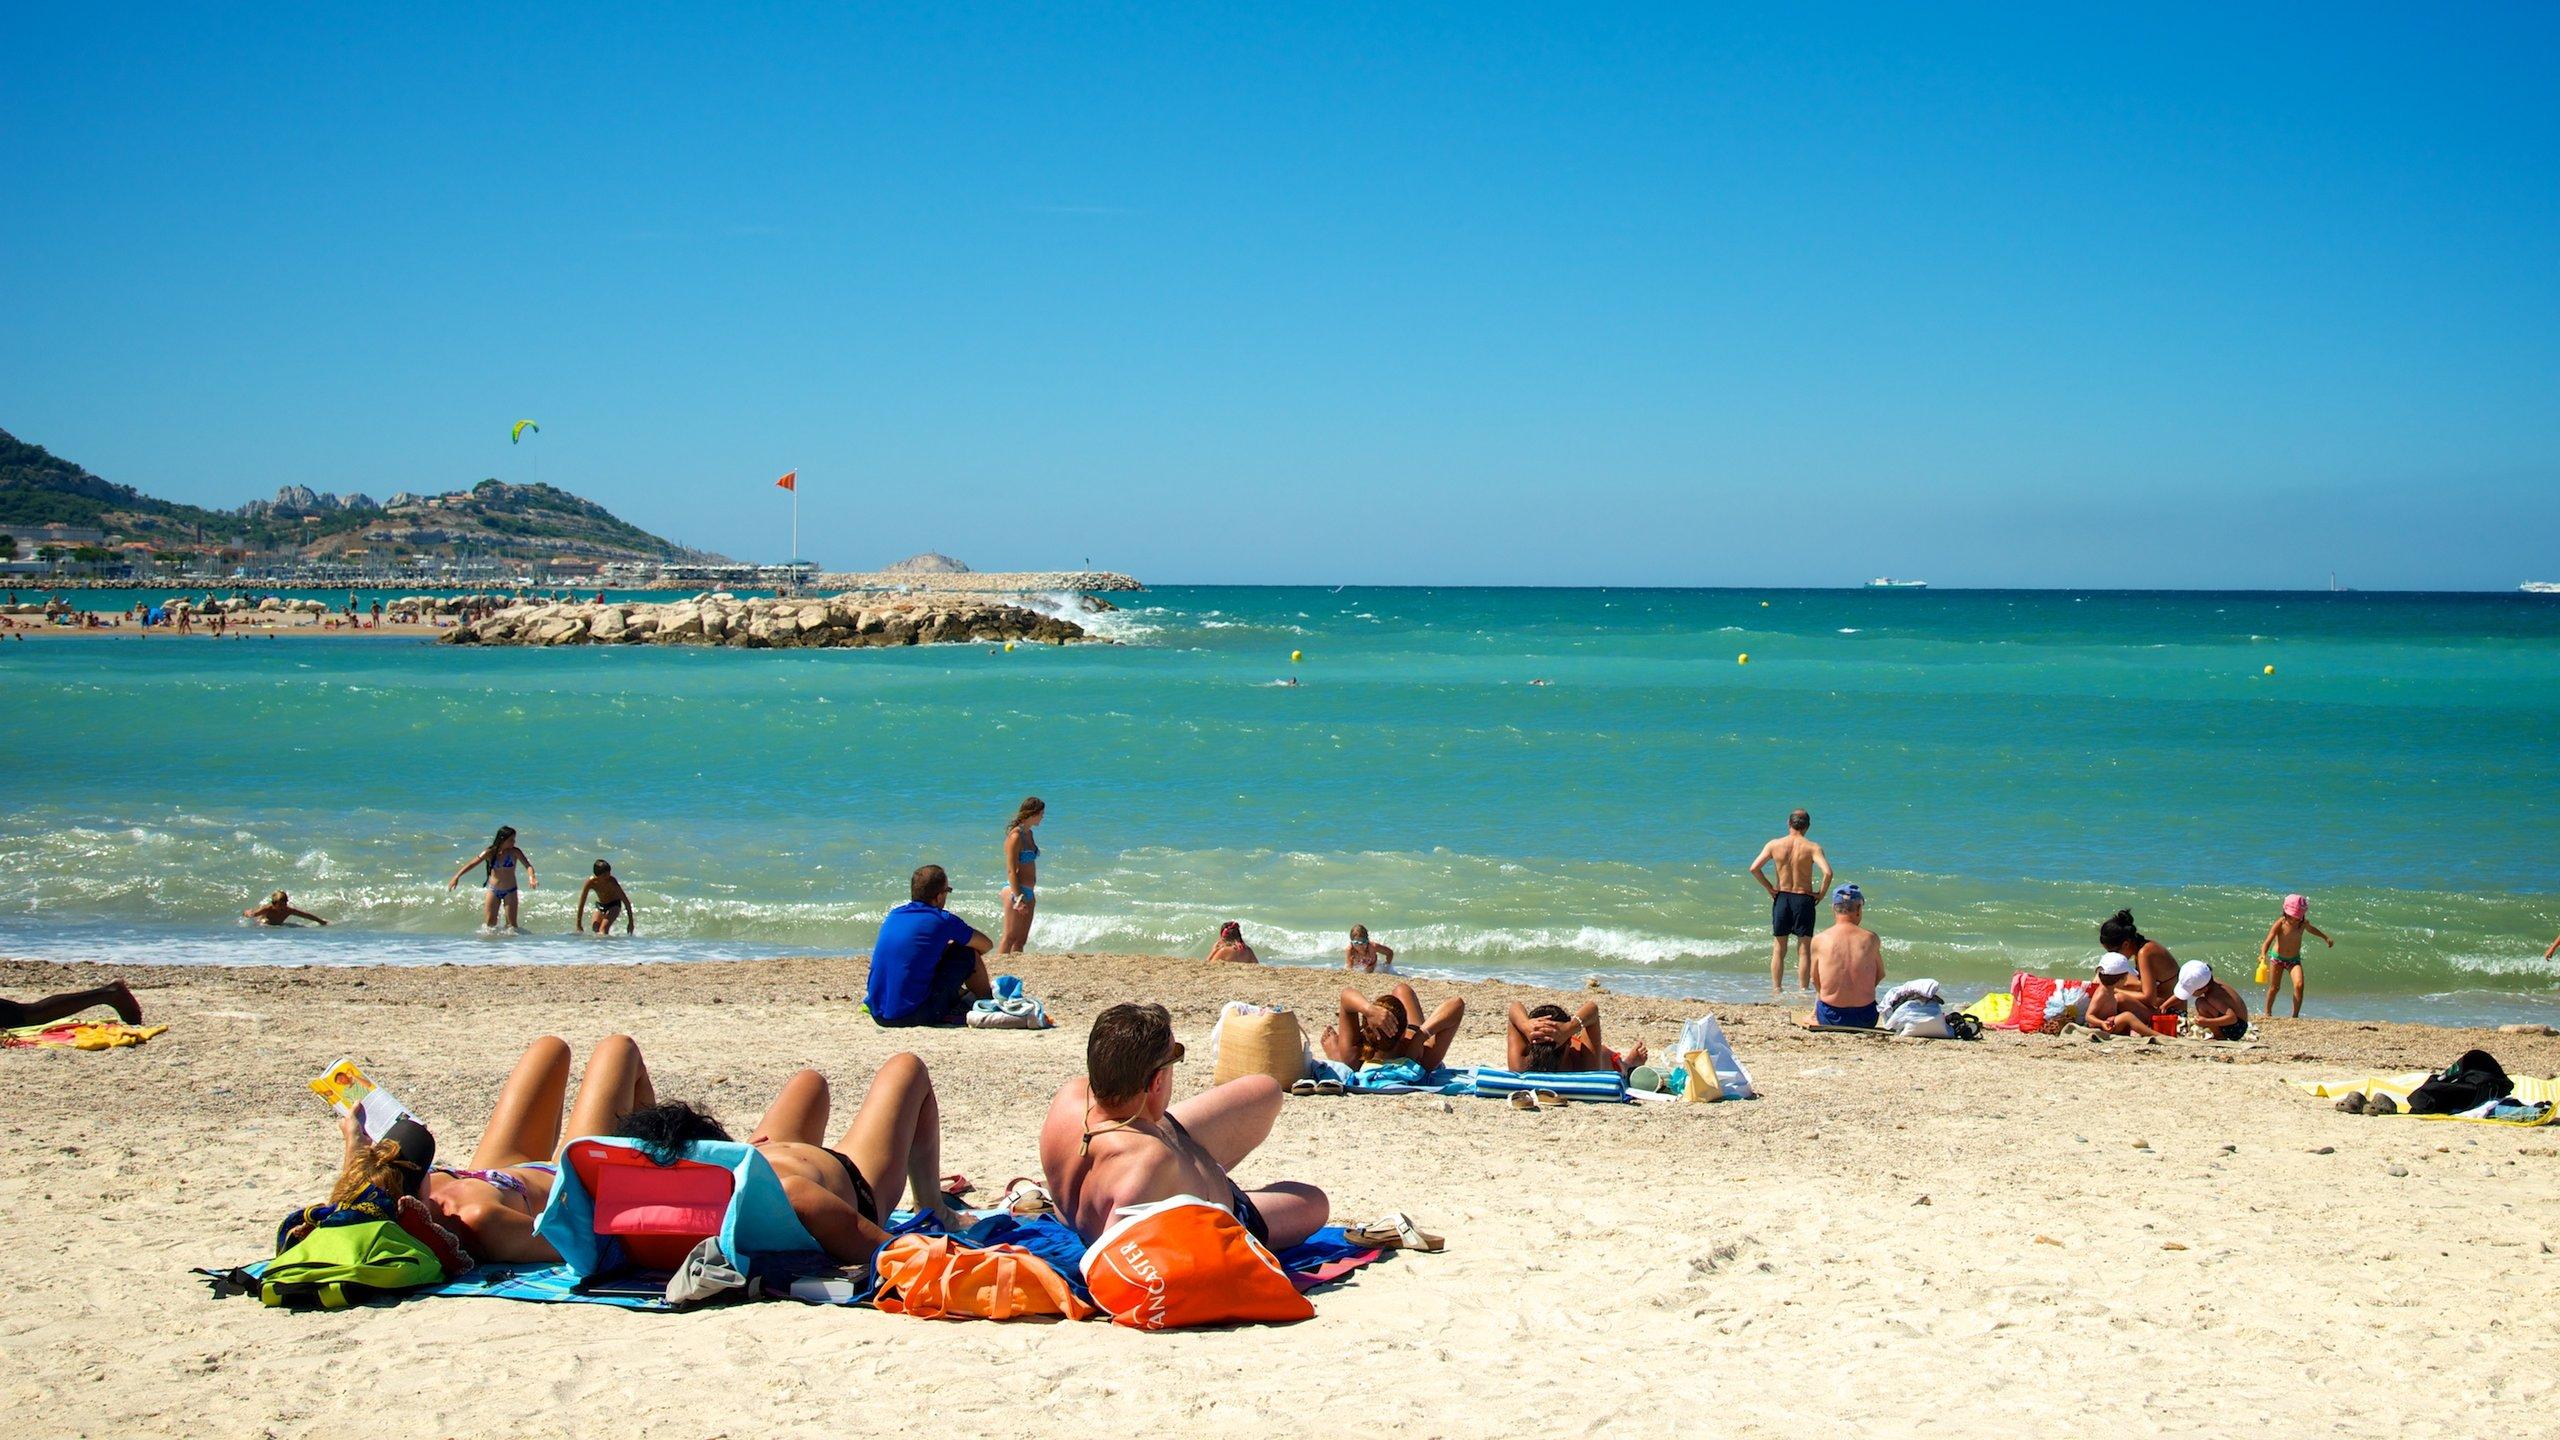 Borely Beach, Marseille, Bouches-du-Rhone, France